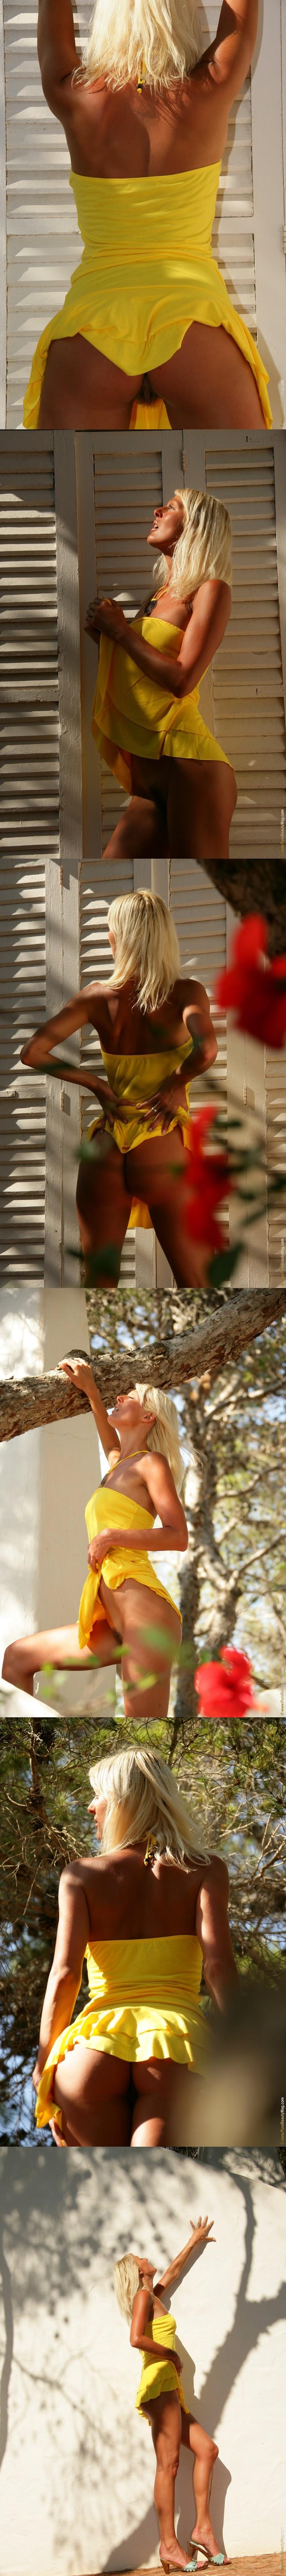 PureBeautyMag_PBM__-_2005-06-28_-_#s88383_-_Vilma_-_Sun_Goddess_-_4992px.zip-jk- PureBeautyMag PBM  - 2005-06-30 - #s88385 - Katerina H - Nude Eve - 2560px